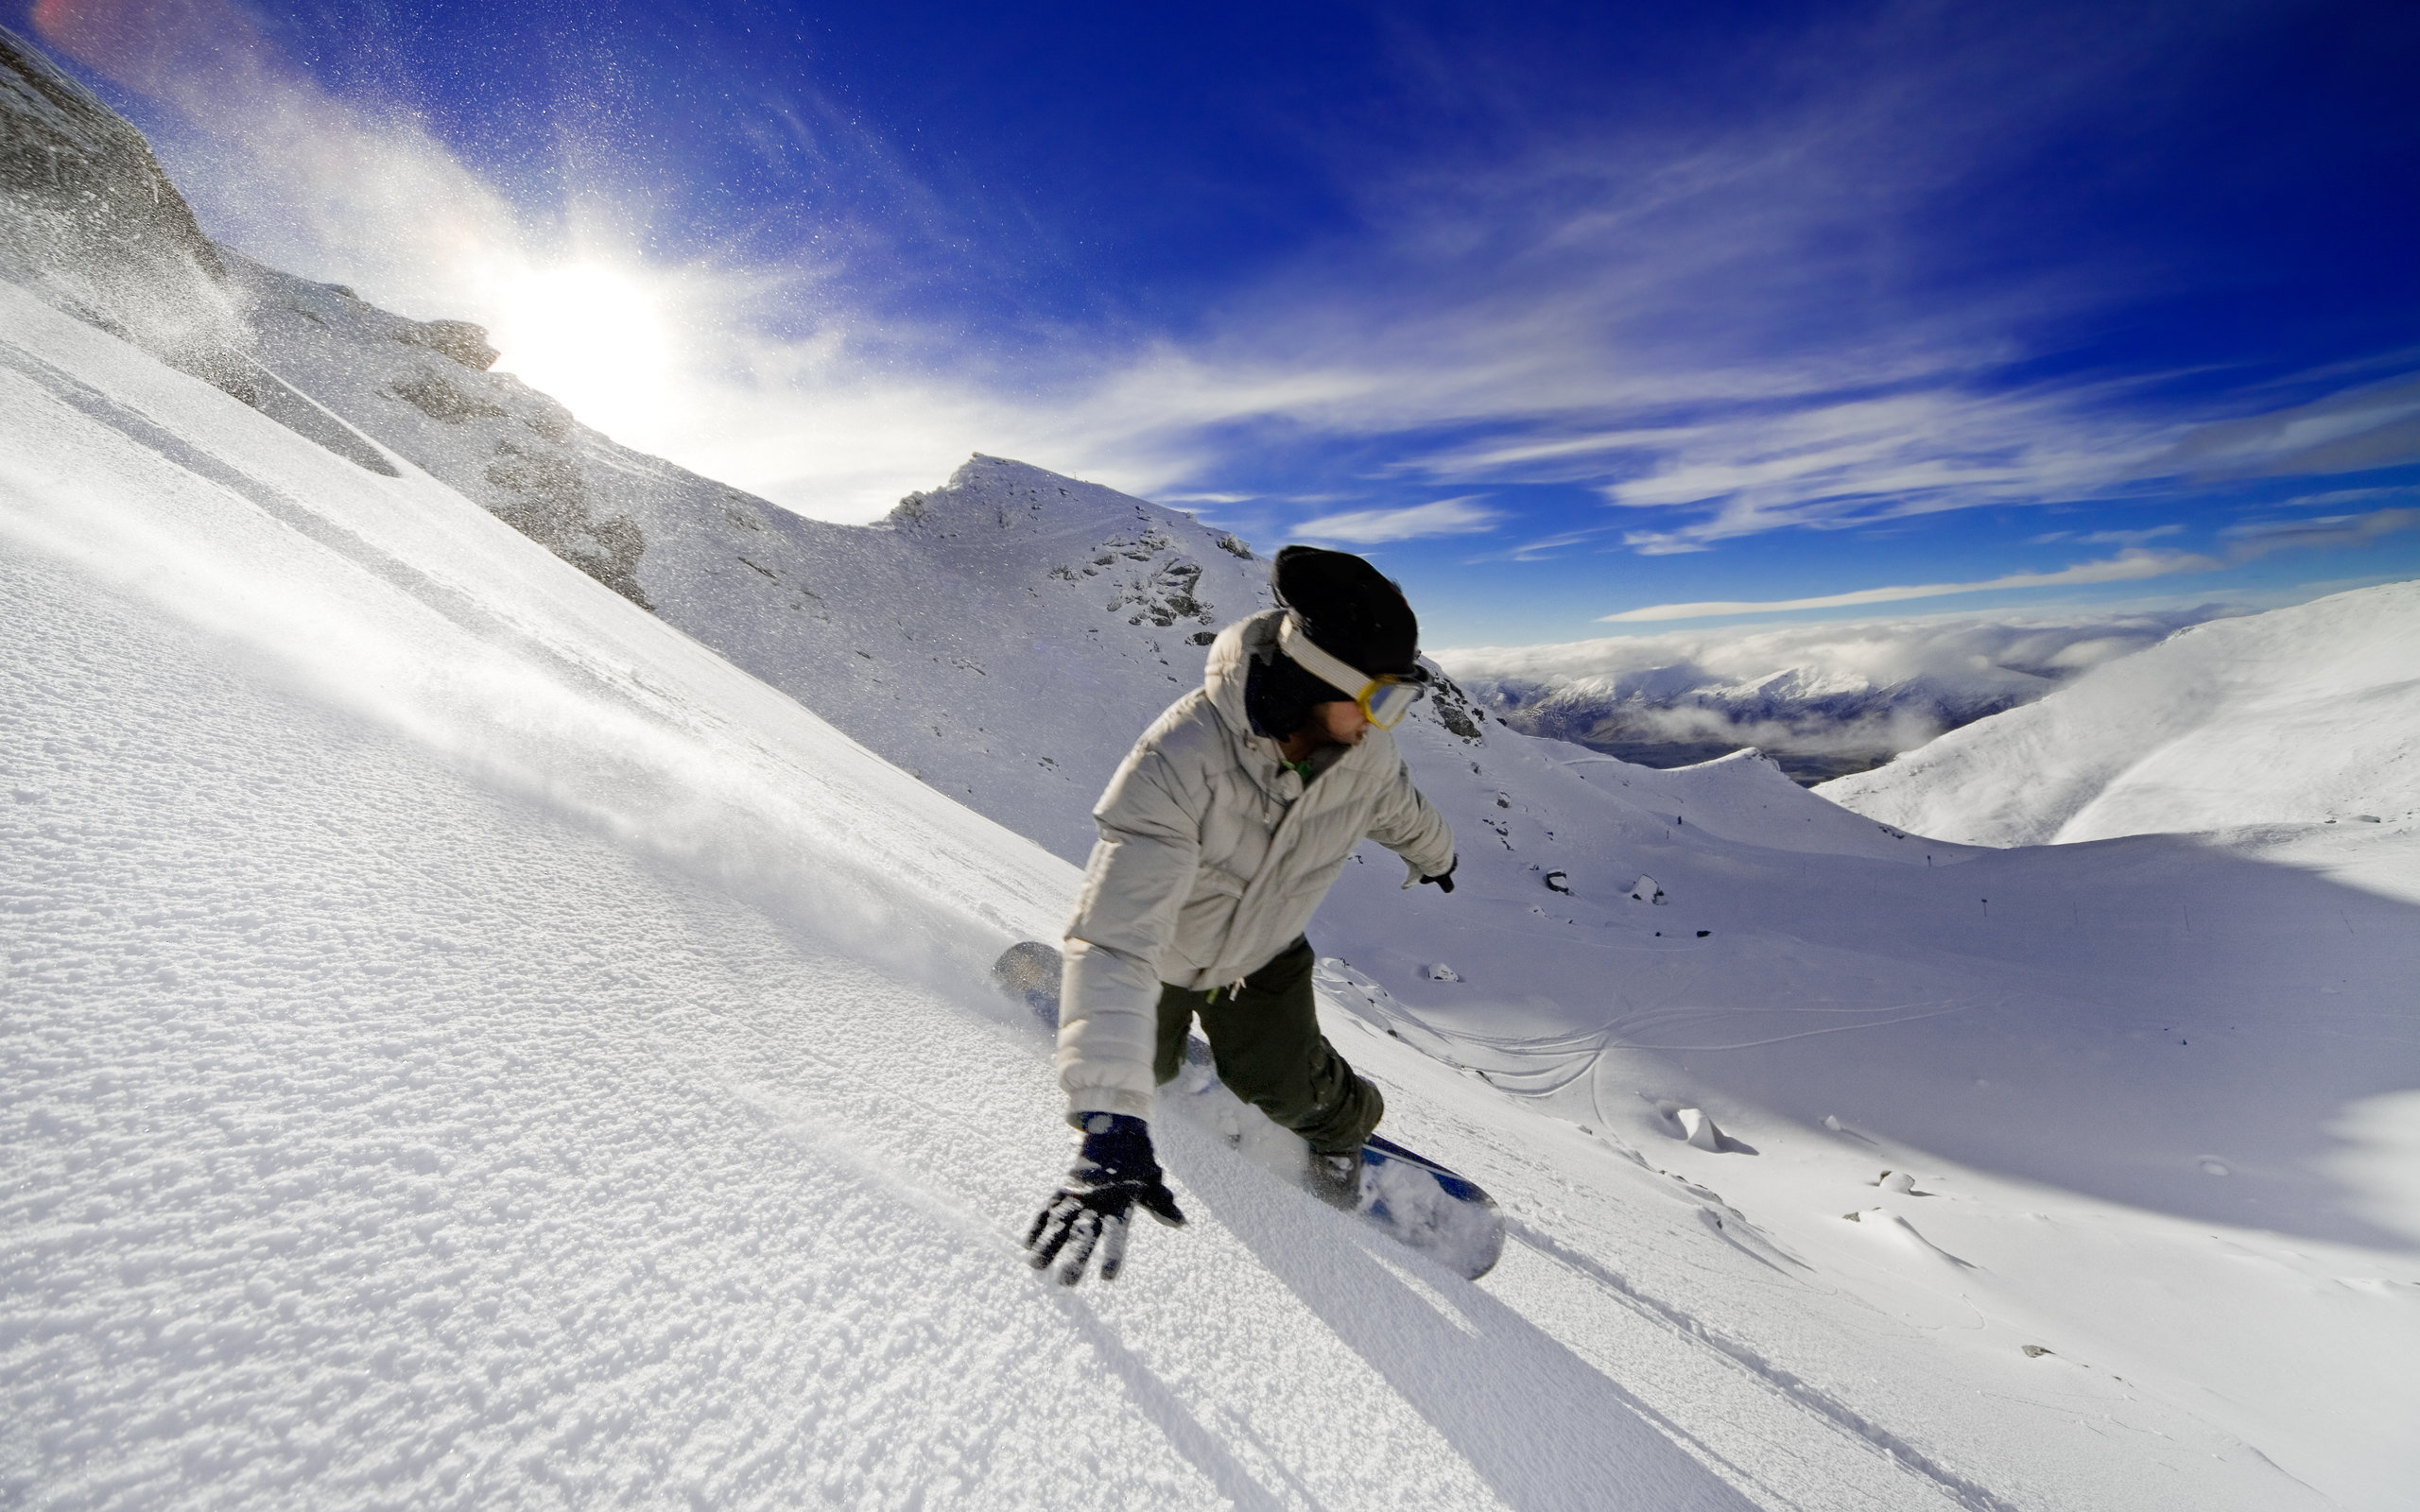 сноубордист вираж снег солнце  № 3559609 без смс